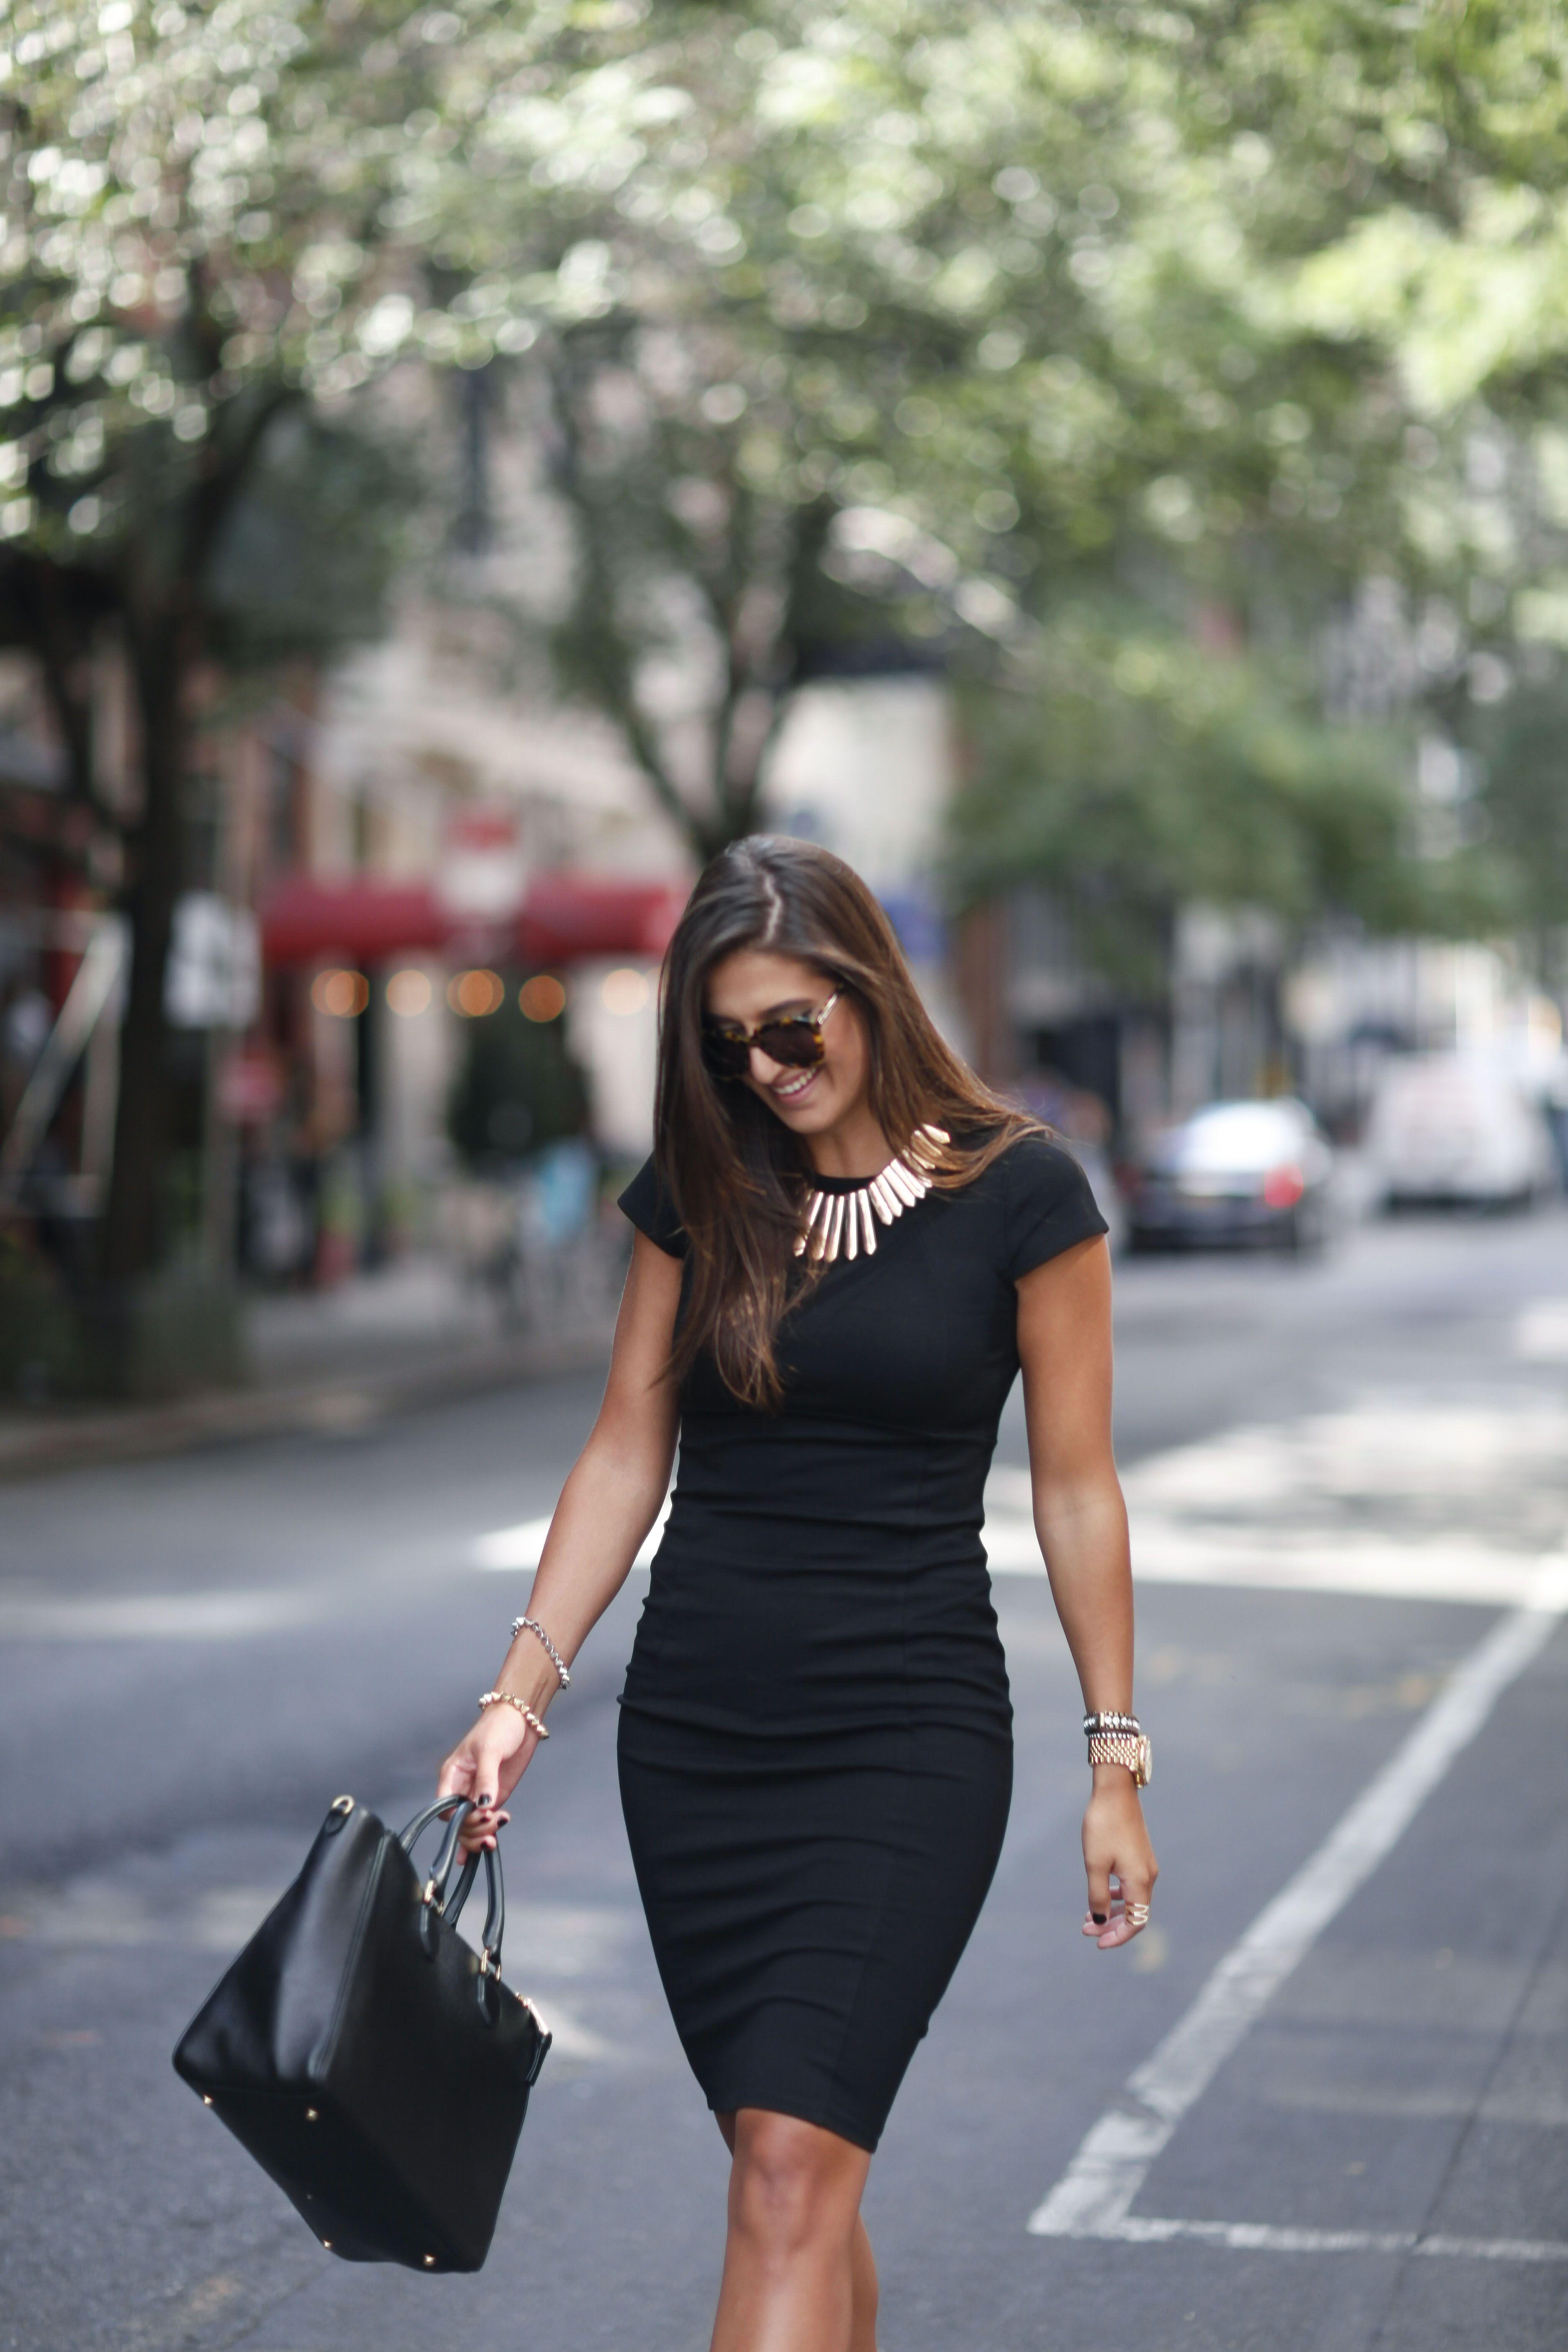 Black Midi Dress A Southern Drawl In 2021 Black Dresses Classy Accessorize Black Dress Black Midi Dress [ 5616 x 3744 Pixel ]